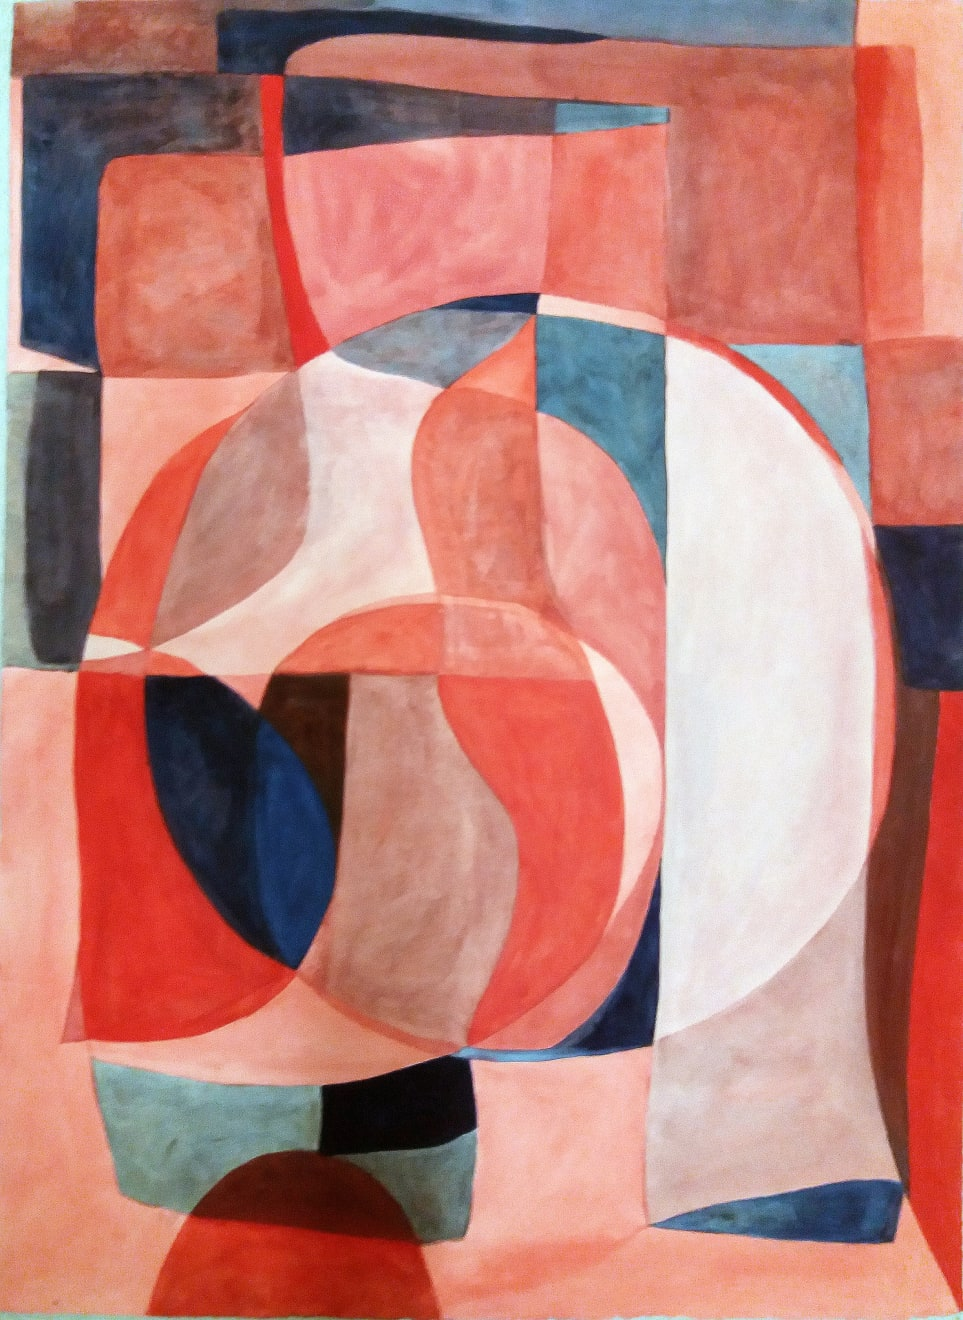 Ronde En Rose Et Bleu Caséine and Arabic Gum on Paper Original 78 x 106 cm $4390 SOLD